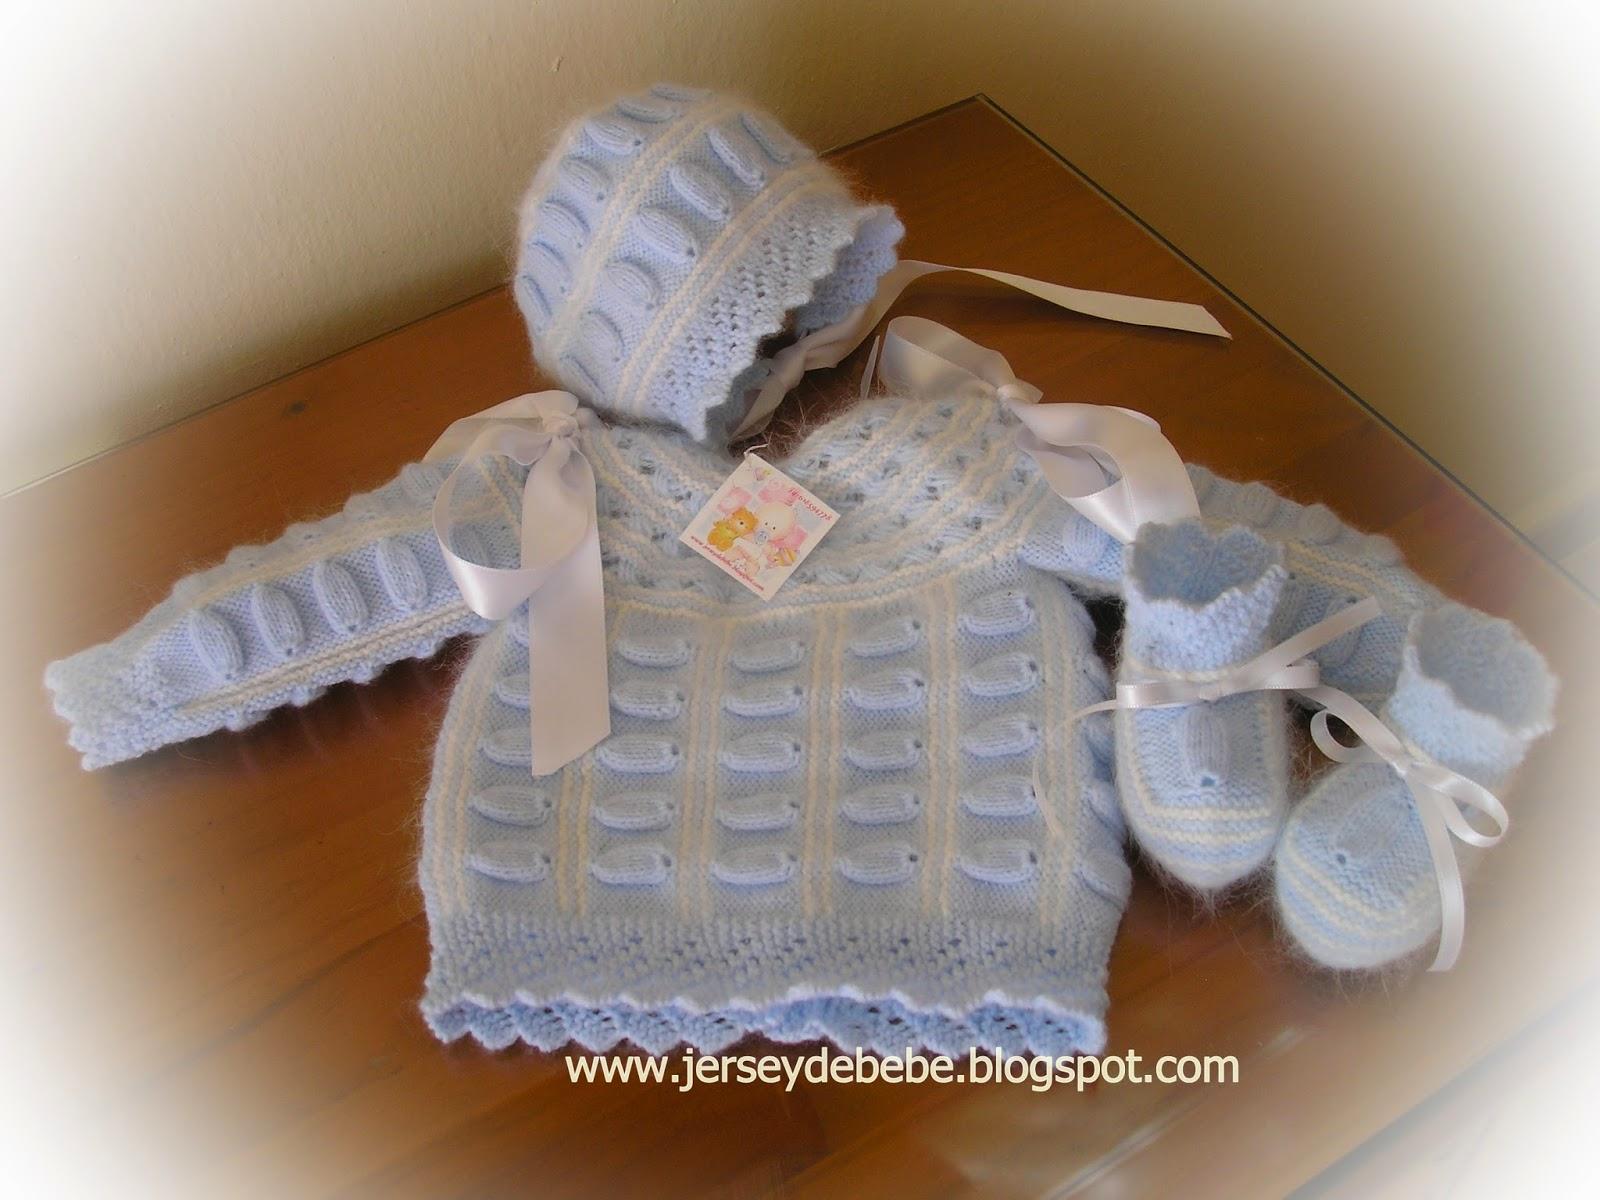 espero que os guste. Publicado por jersey de bebe primera edad ... e8cfaa63162